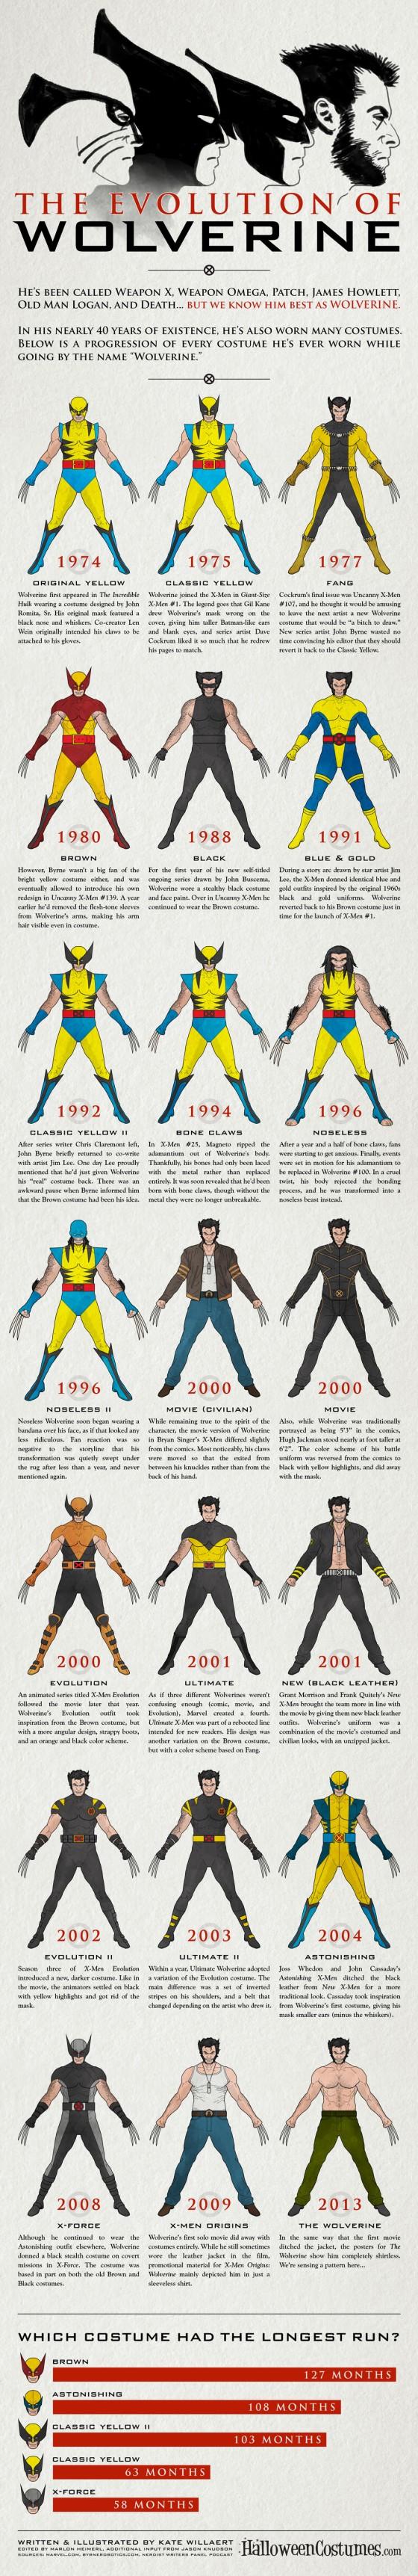 Wolverine's Costume Evolution.